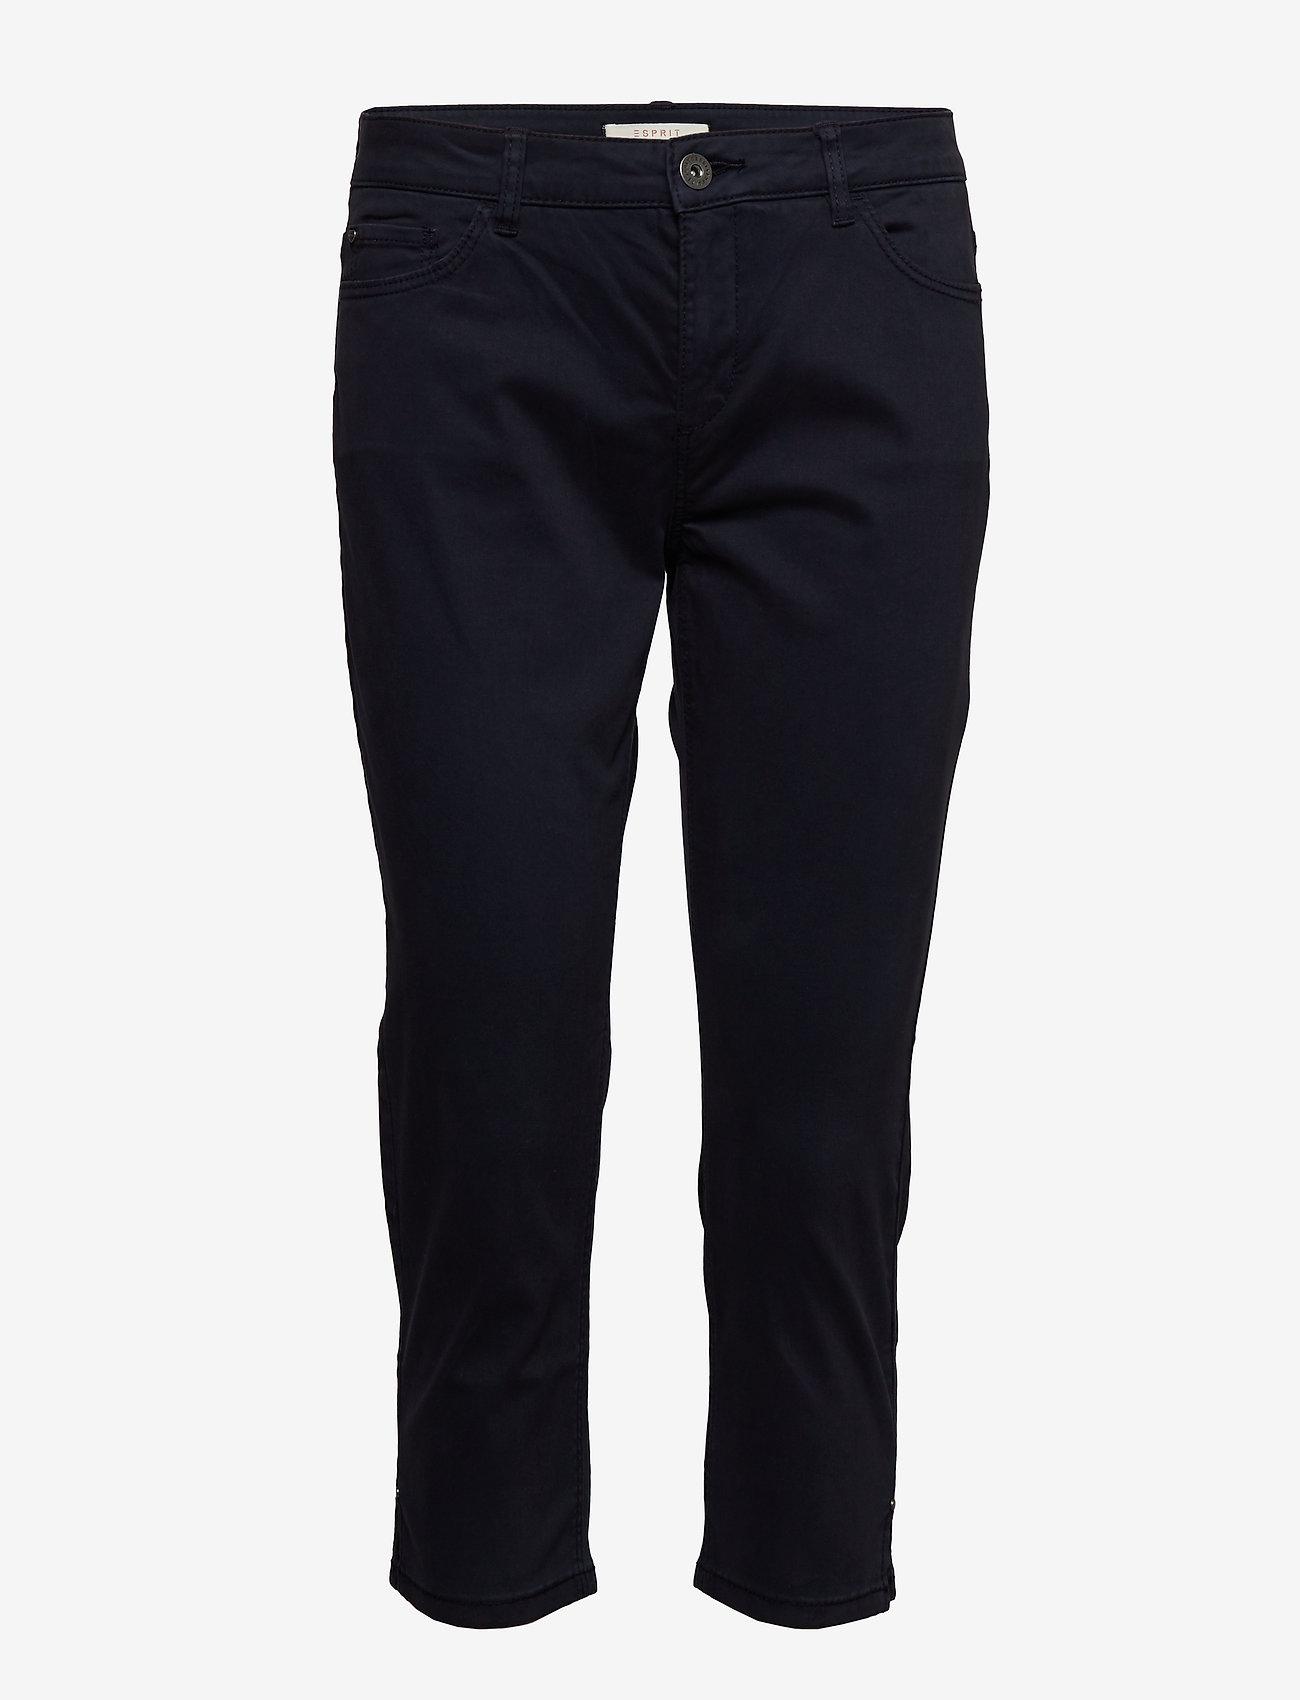 Esprit Casual - Pants woven - casual bukser - navy - 0